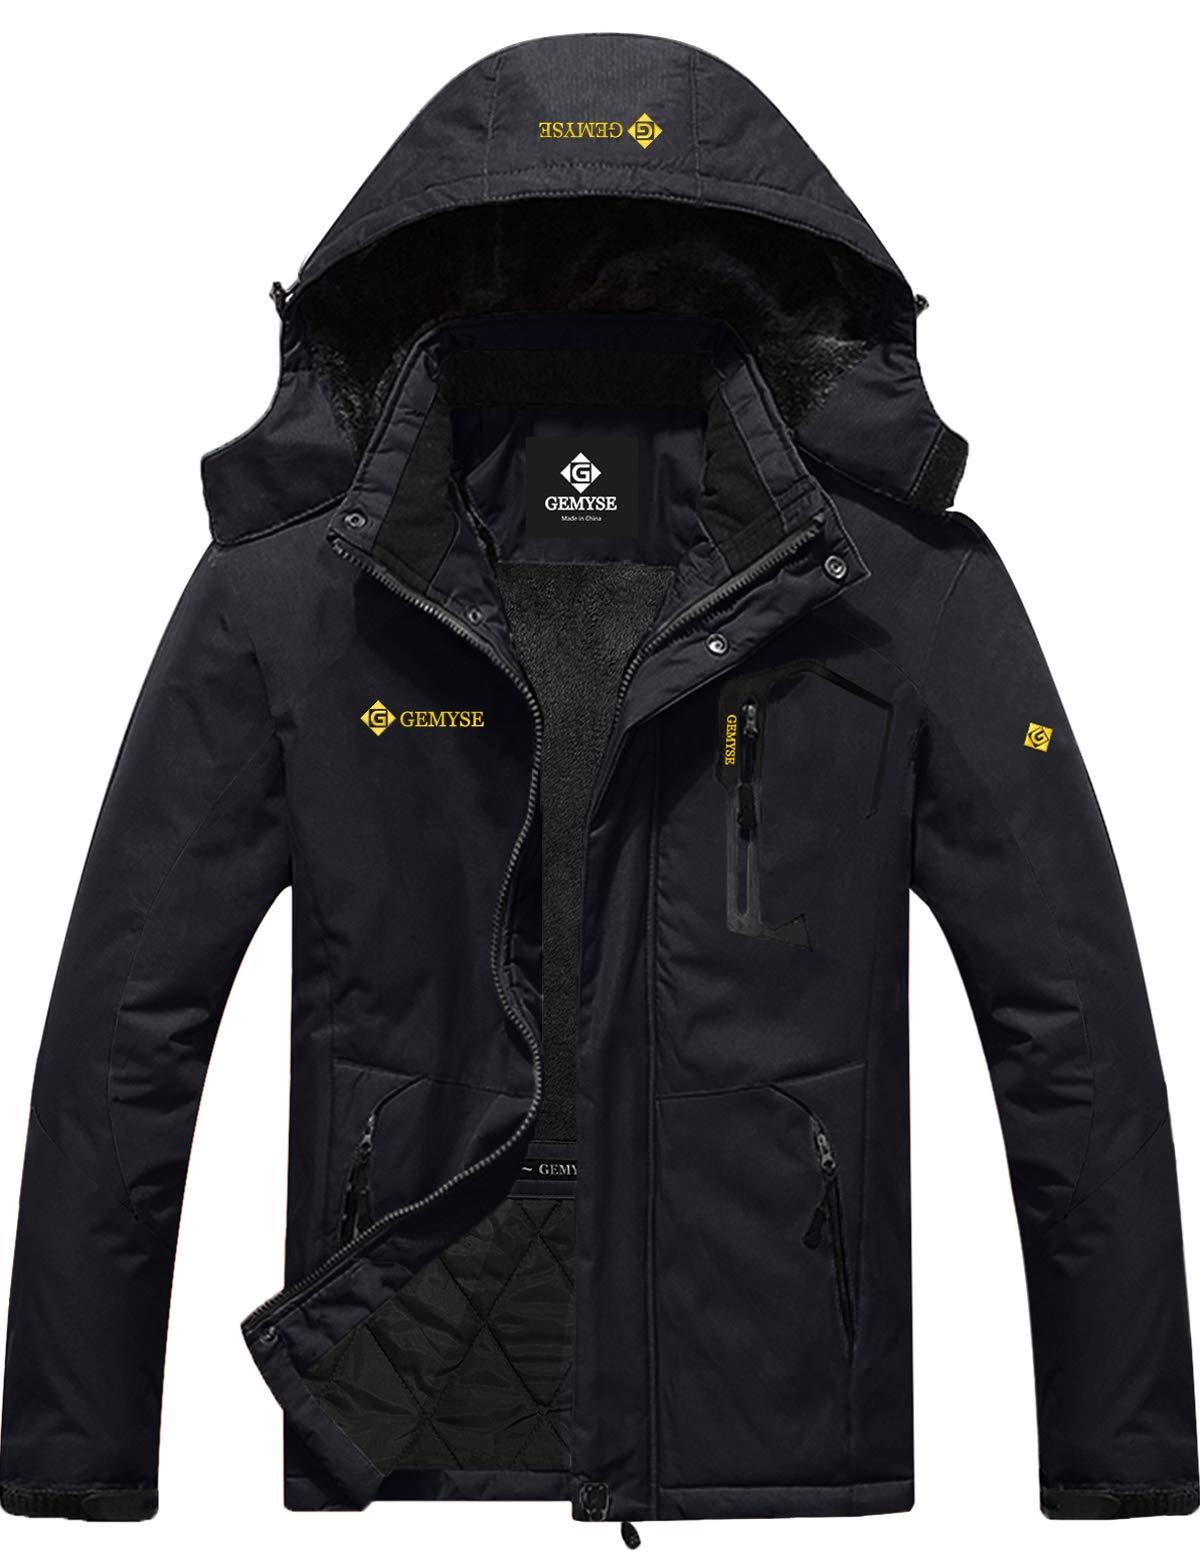 GEMYSE Men's Mountain Waterproof Ski Snow Jacket Winter Windproof Rain Jacket (Black,L) by GEMYSE